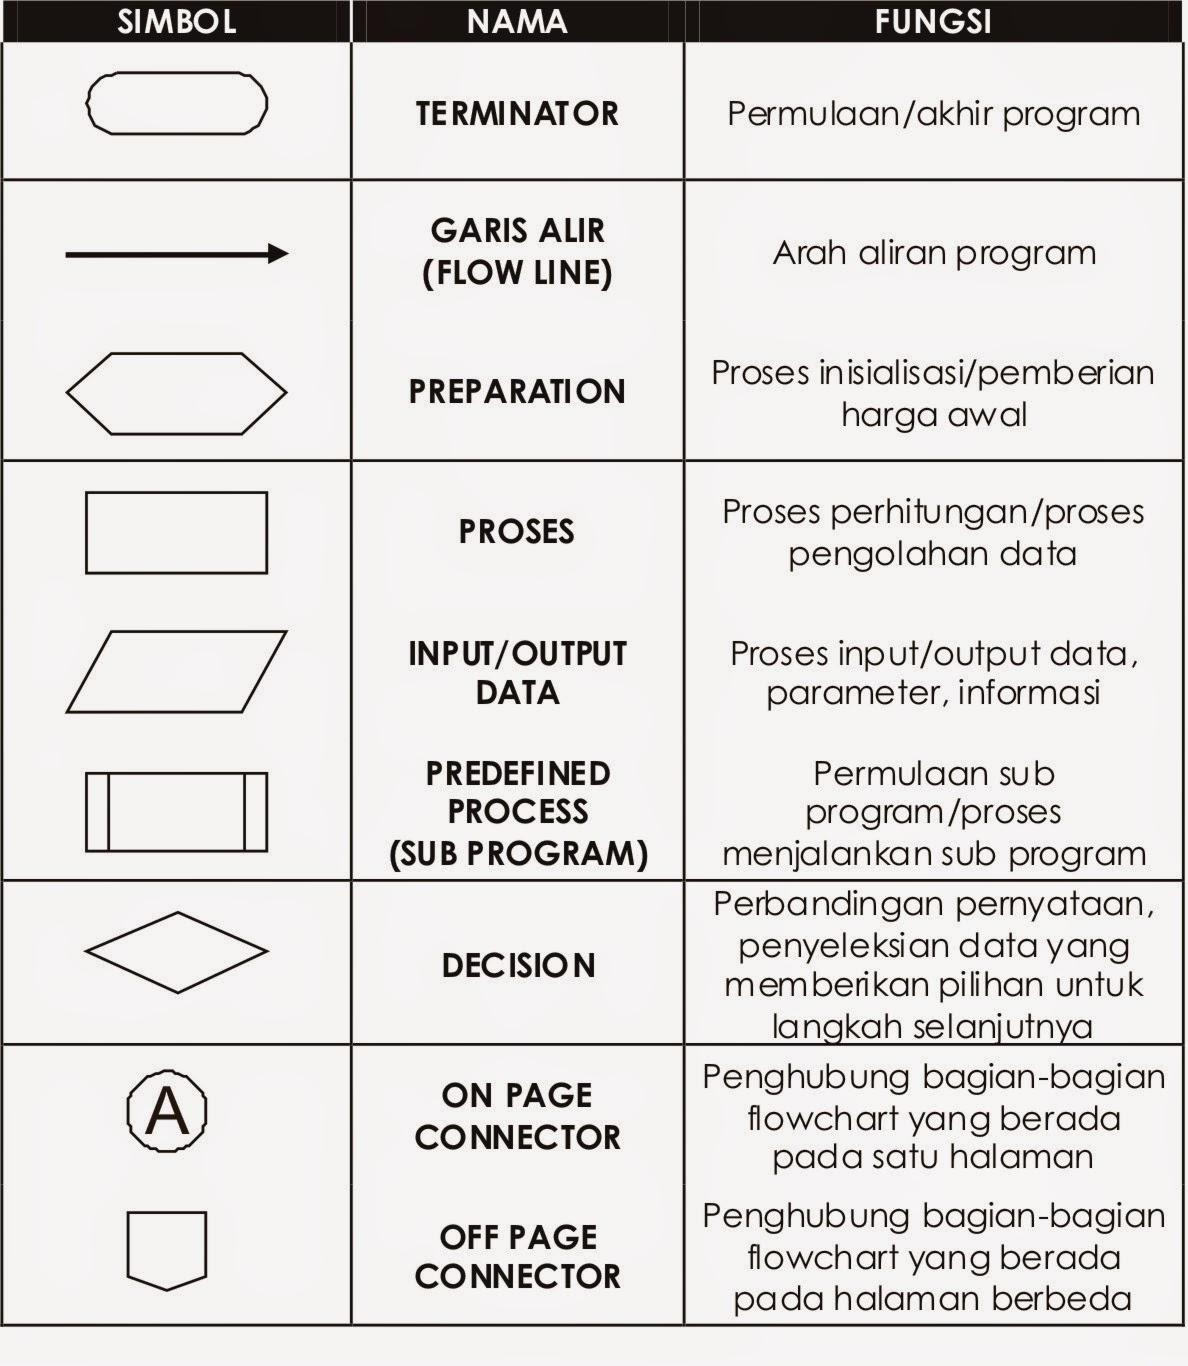 Penjelasan singkat flowchart kumpulan tugas kuliah penggunaan microsoft office yang mana microsoft office merujuk simbol simbol dasar flowchart kepada simbol simbol flowchart untuk pengolahan data ccuart Images